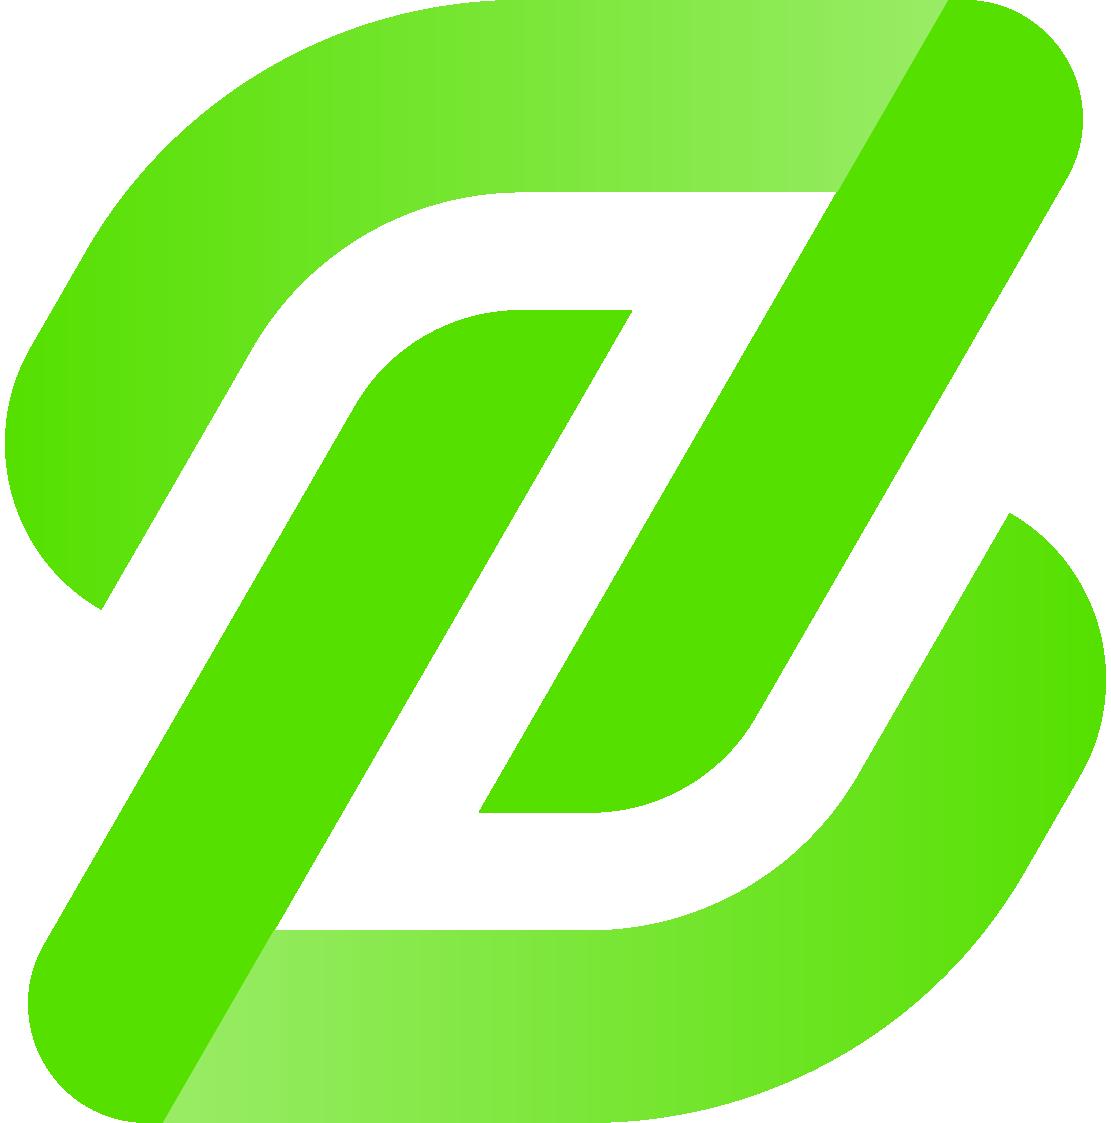 Zunify logo